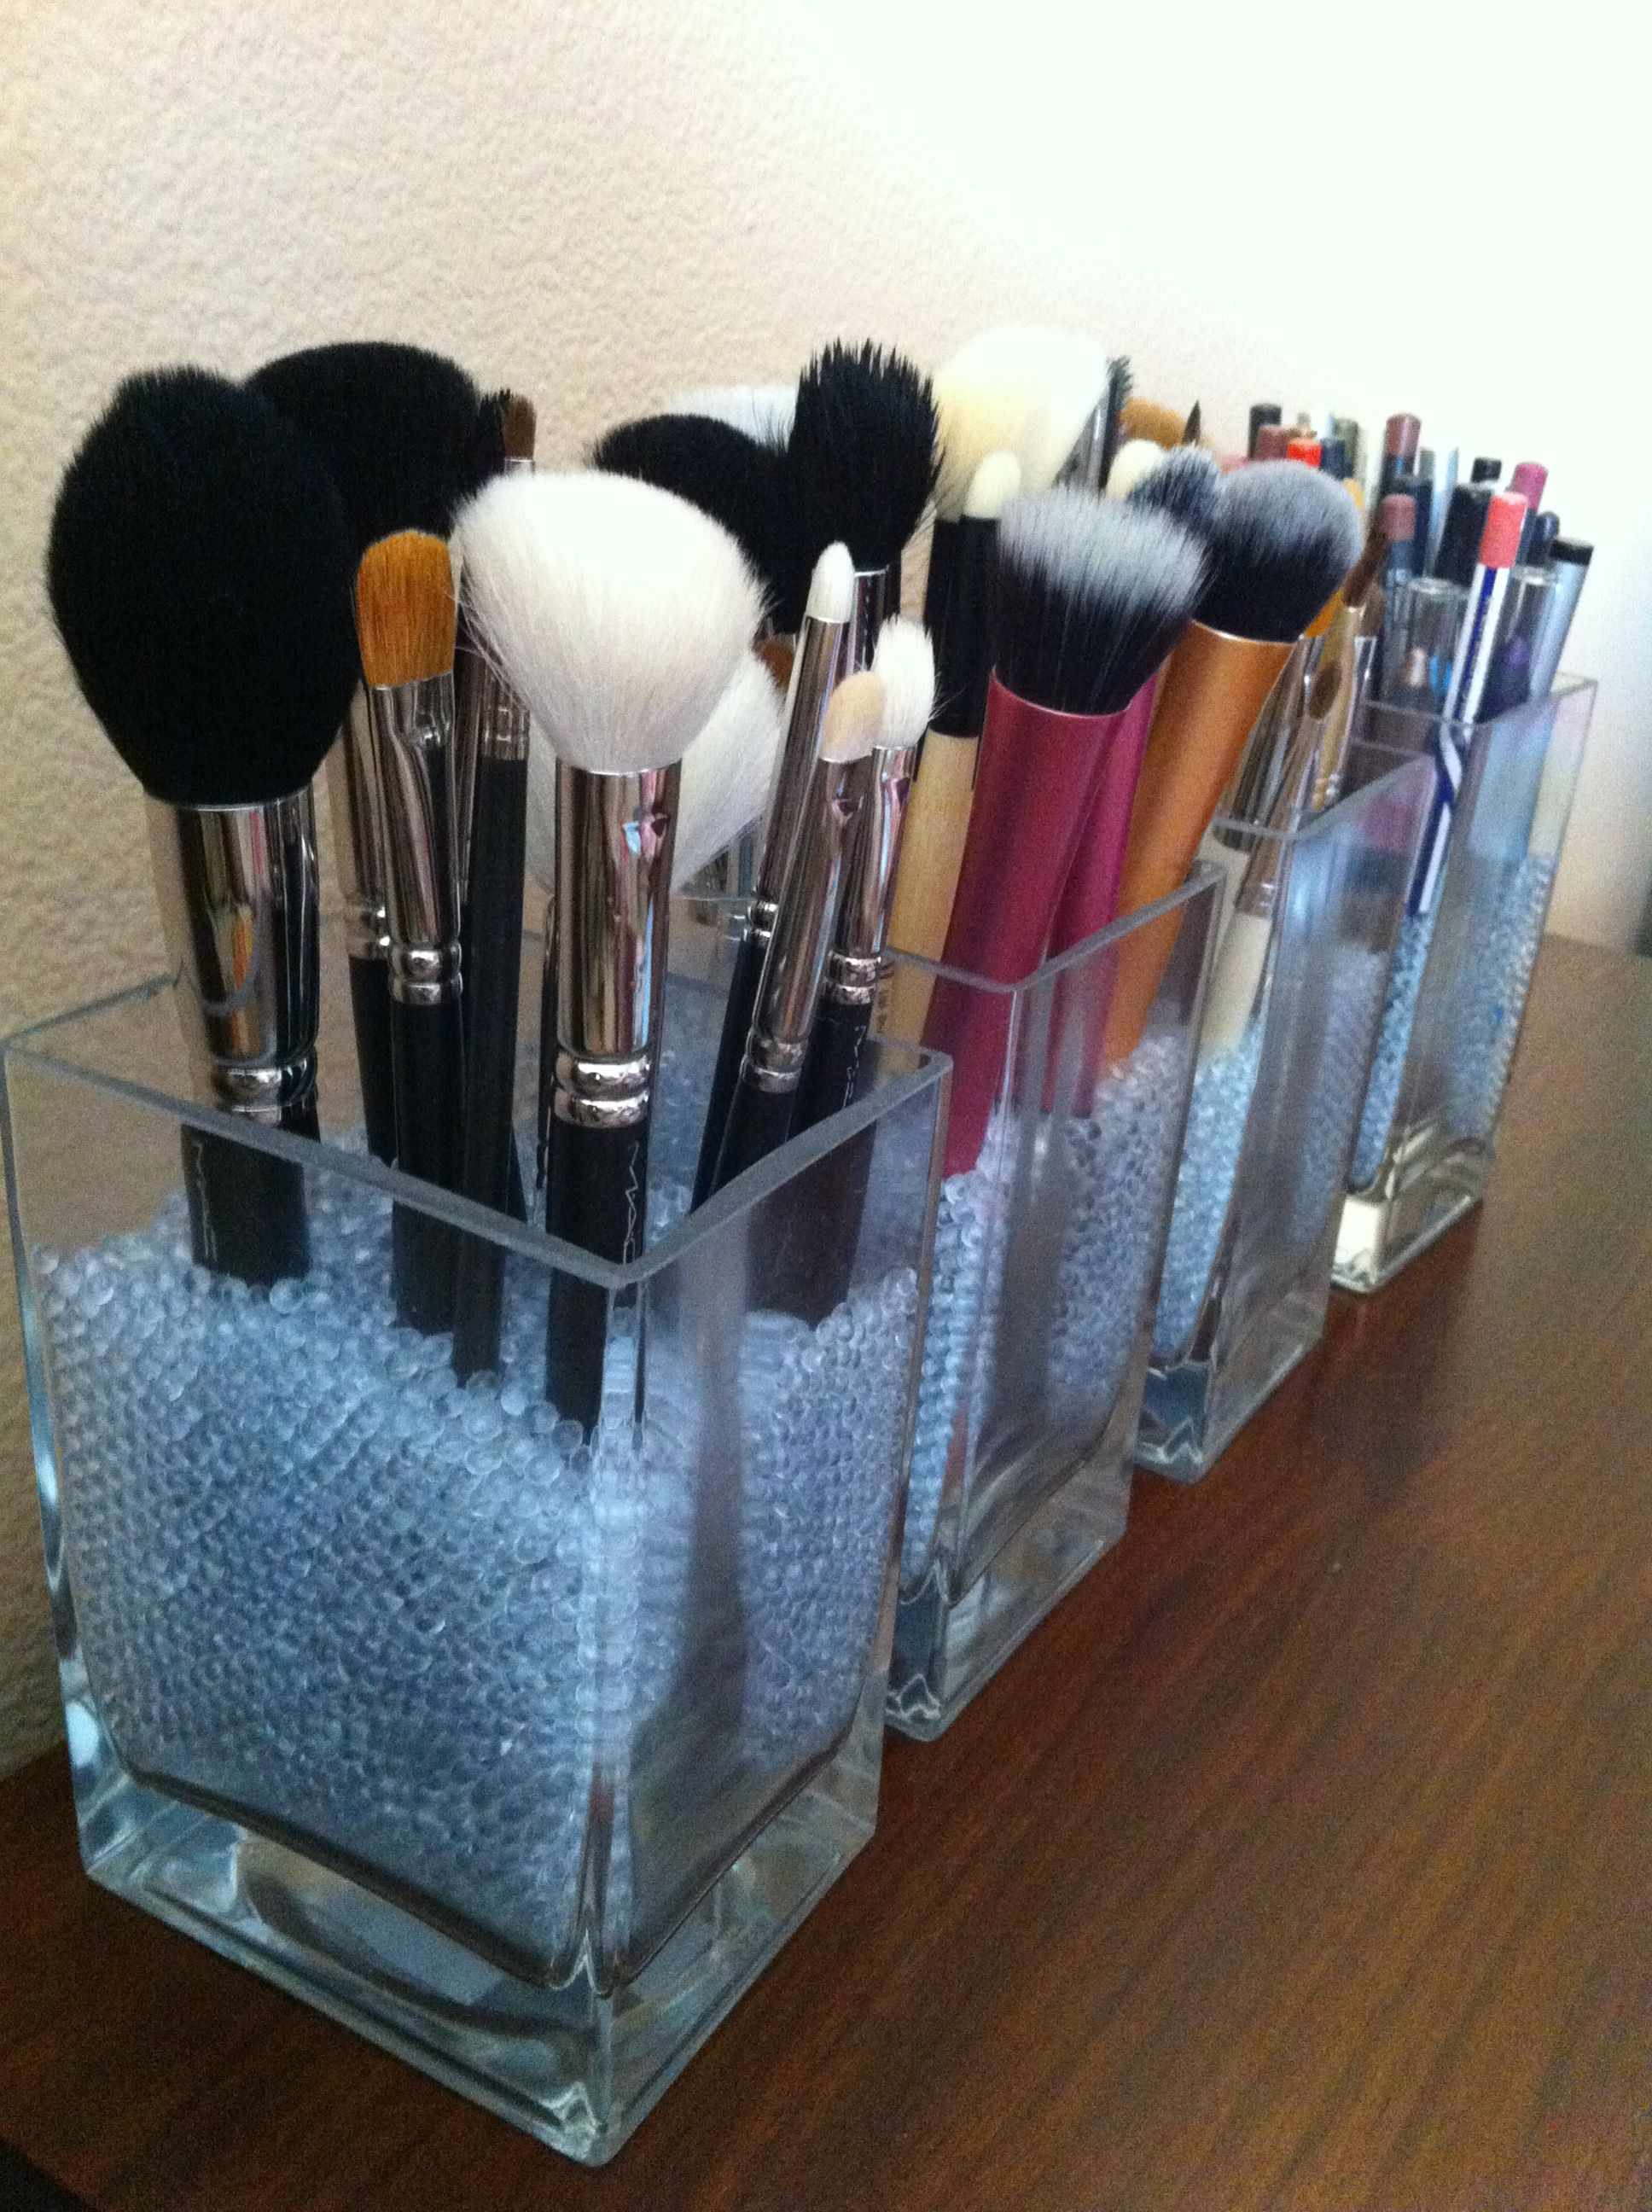 Makeup and Brush Organization (With images) Makeup